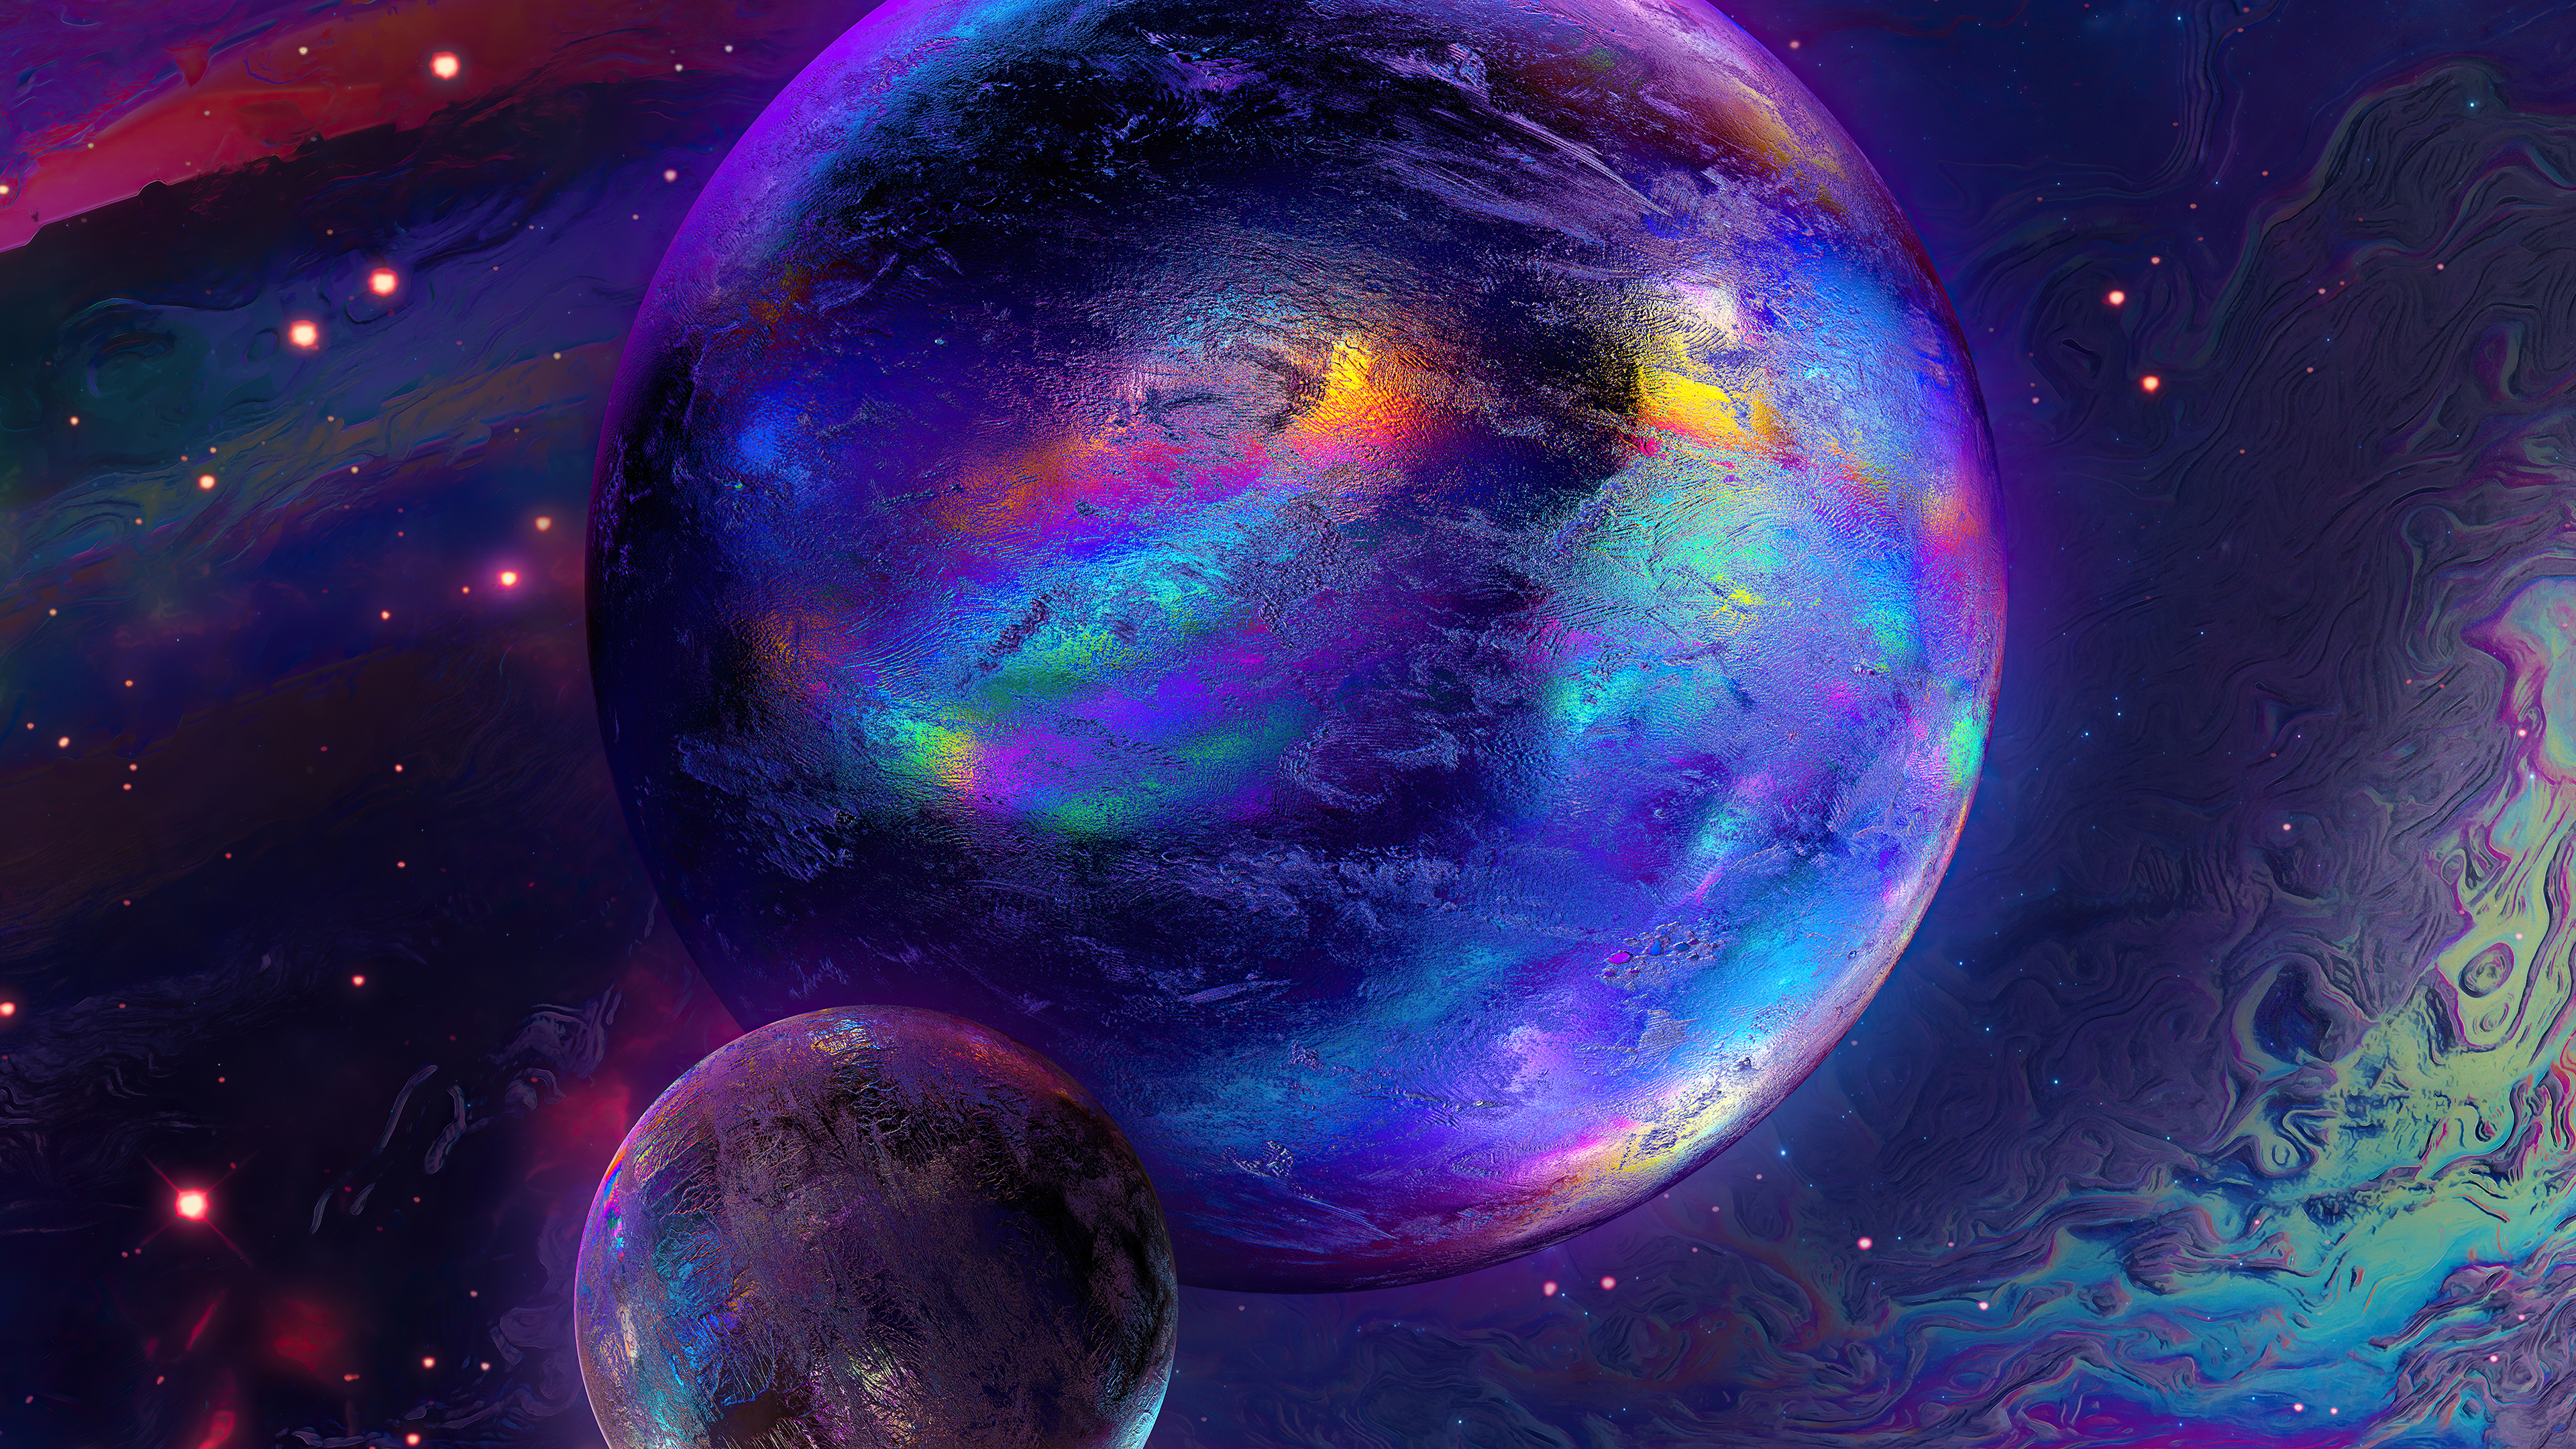 cosmonaut planet 4k 1629256169 - Cosmonaut Planet 4k - Cosmonaut Planet wallpapers, Cosmonaut Planet 4k wallpapers